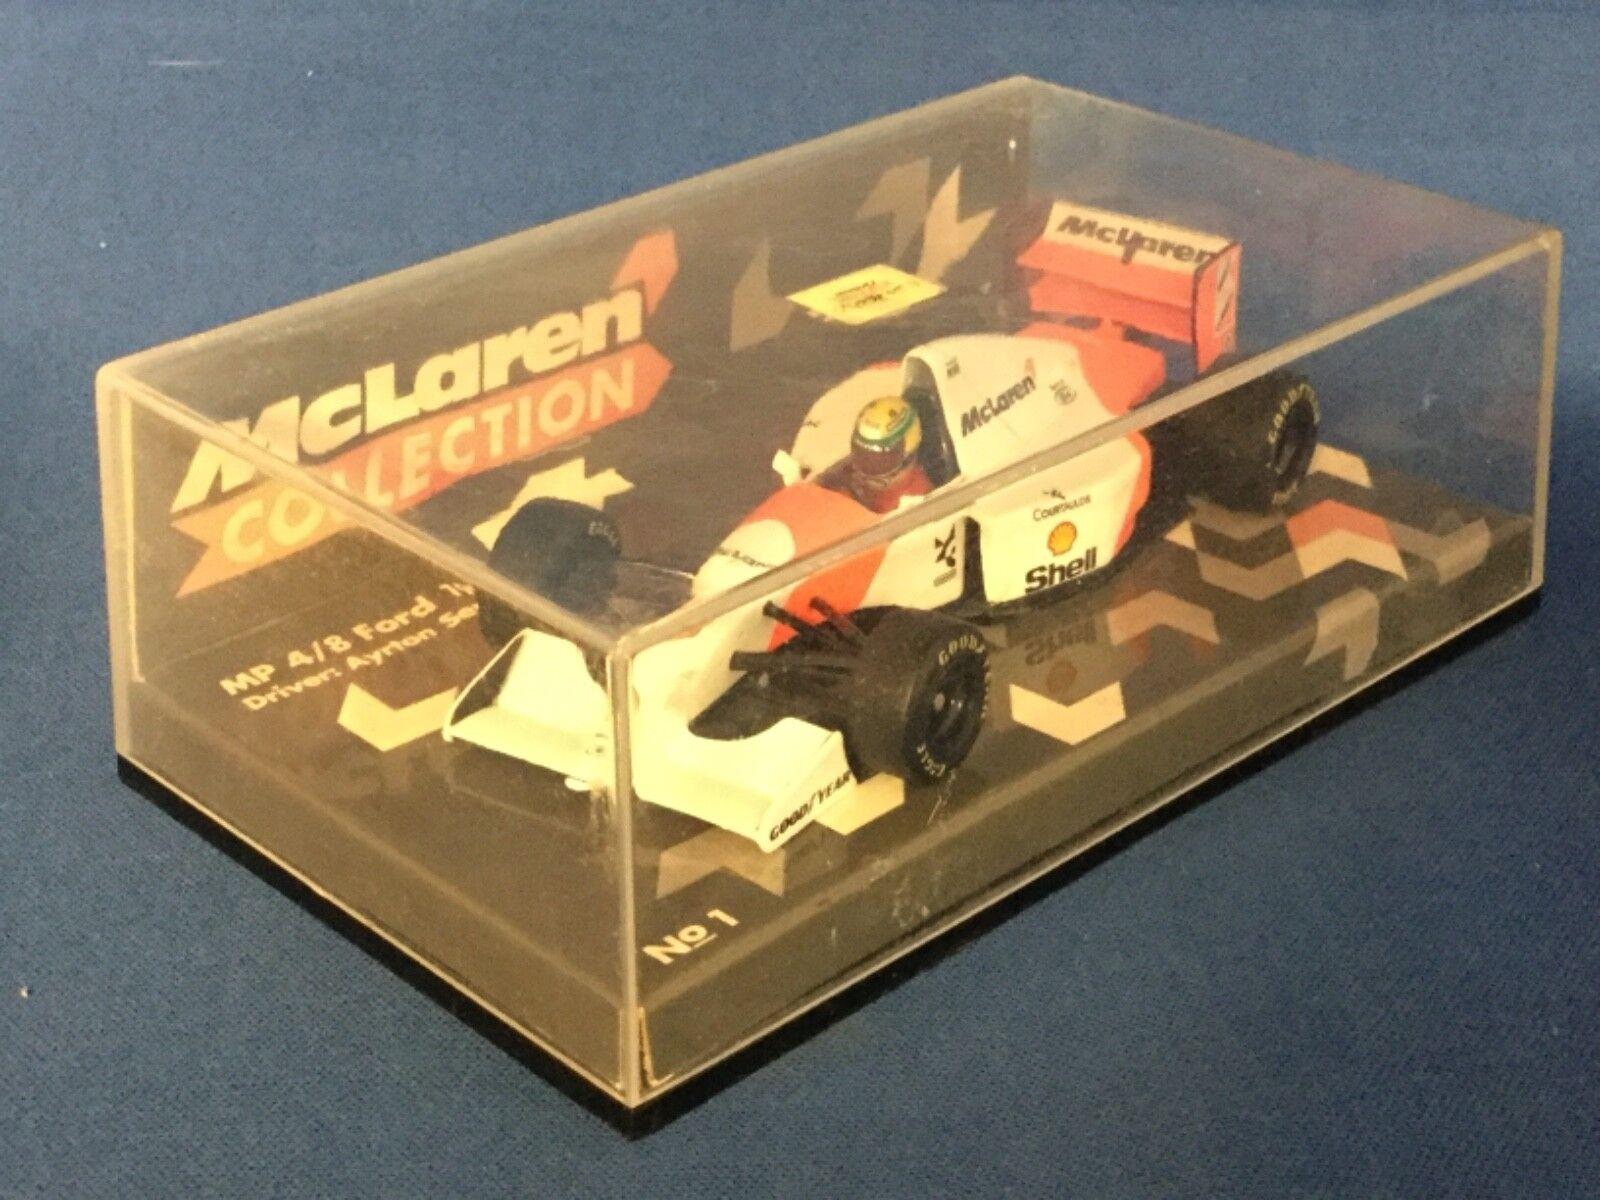 almacén al por mayor Minichamps McLaren F1 93 Senna Modelo Modelo Modelo de Coche Número de artículo 530 930008  el mas de moda